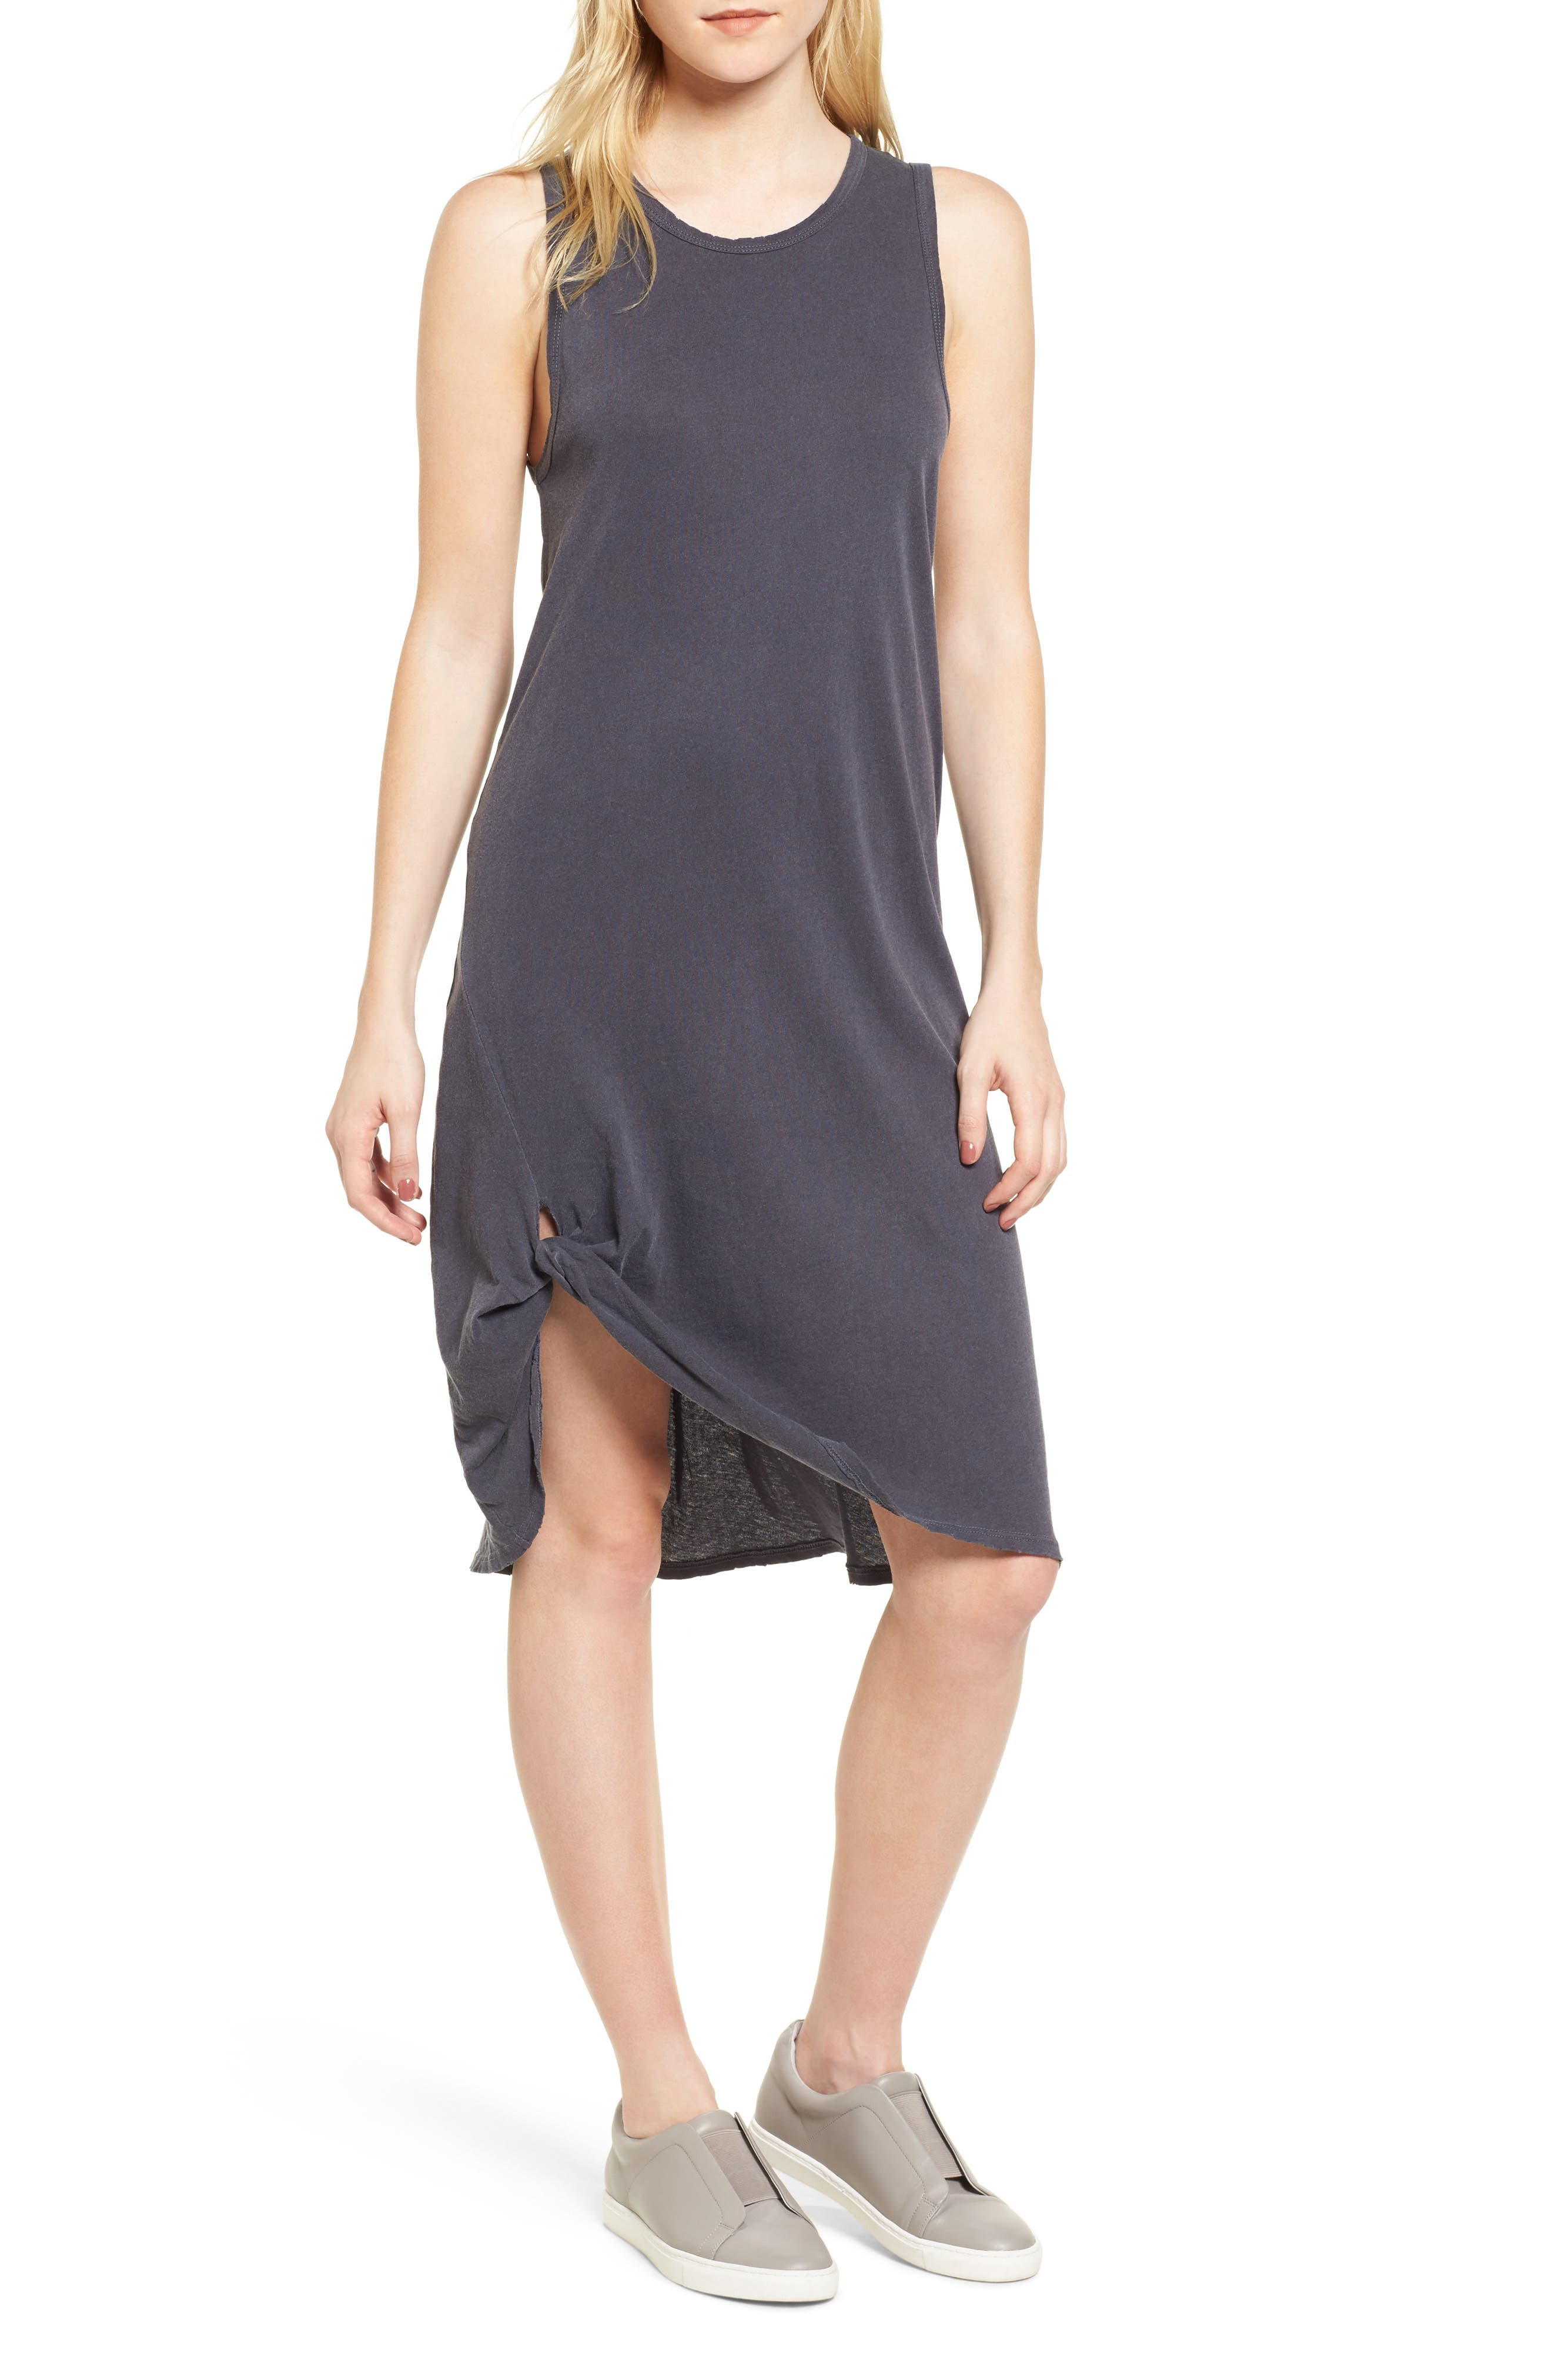 Boo Jersey Tank Dress,                             Main thumbnail 1, color,                             Asphalt